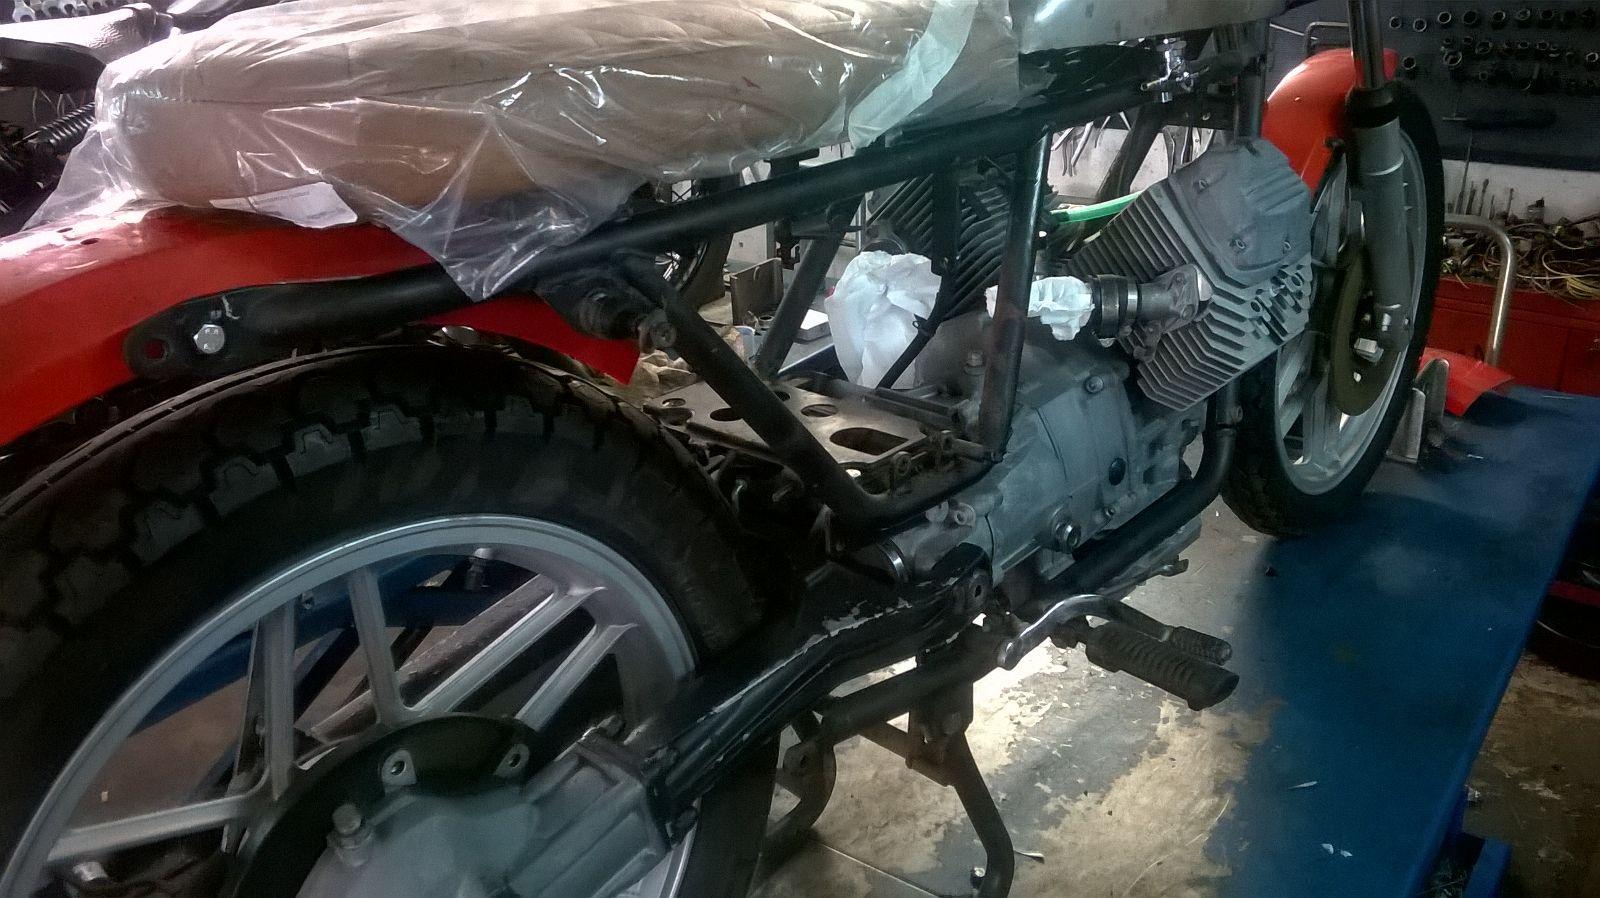 restauro moto d'epoca particolare 1